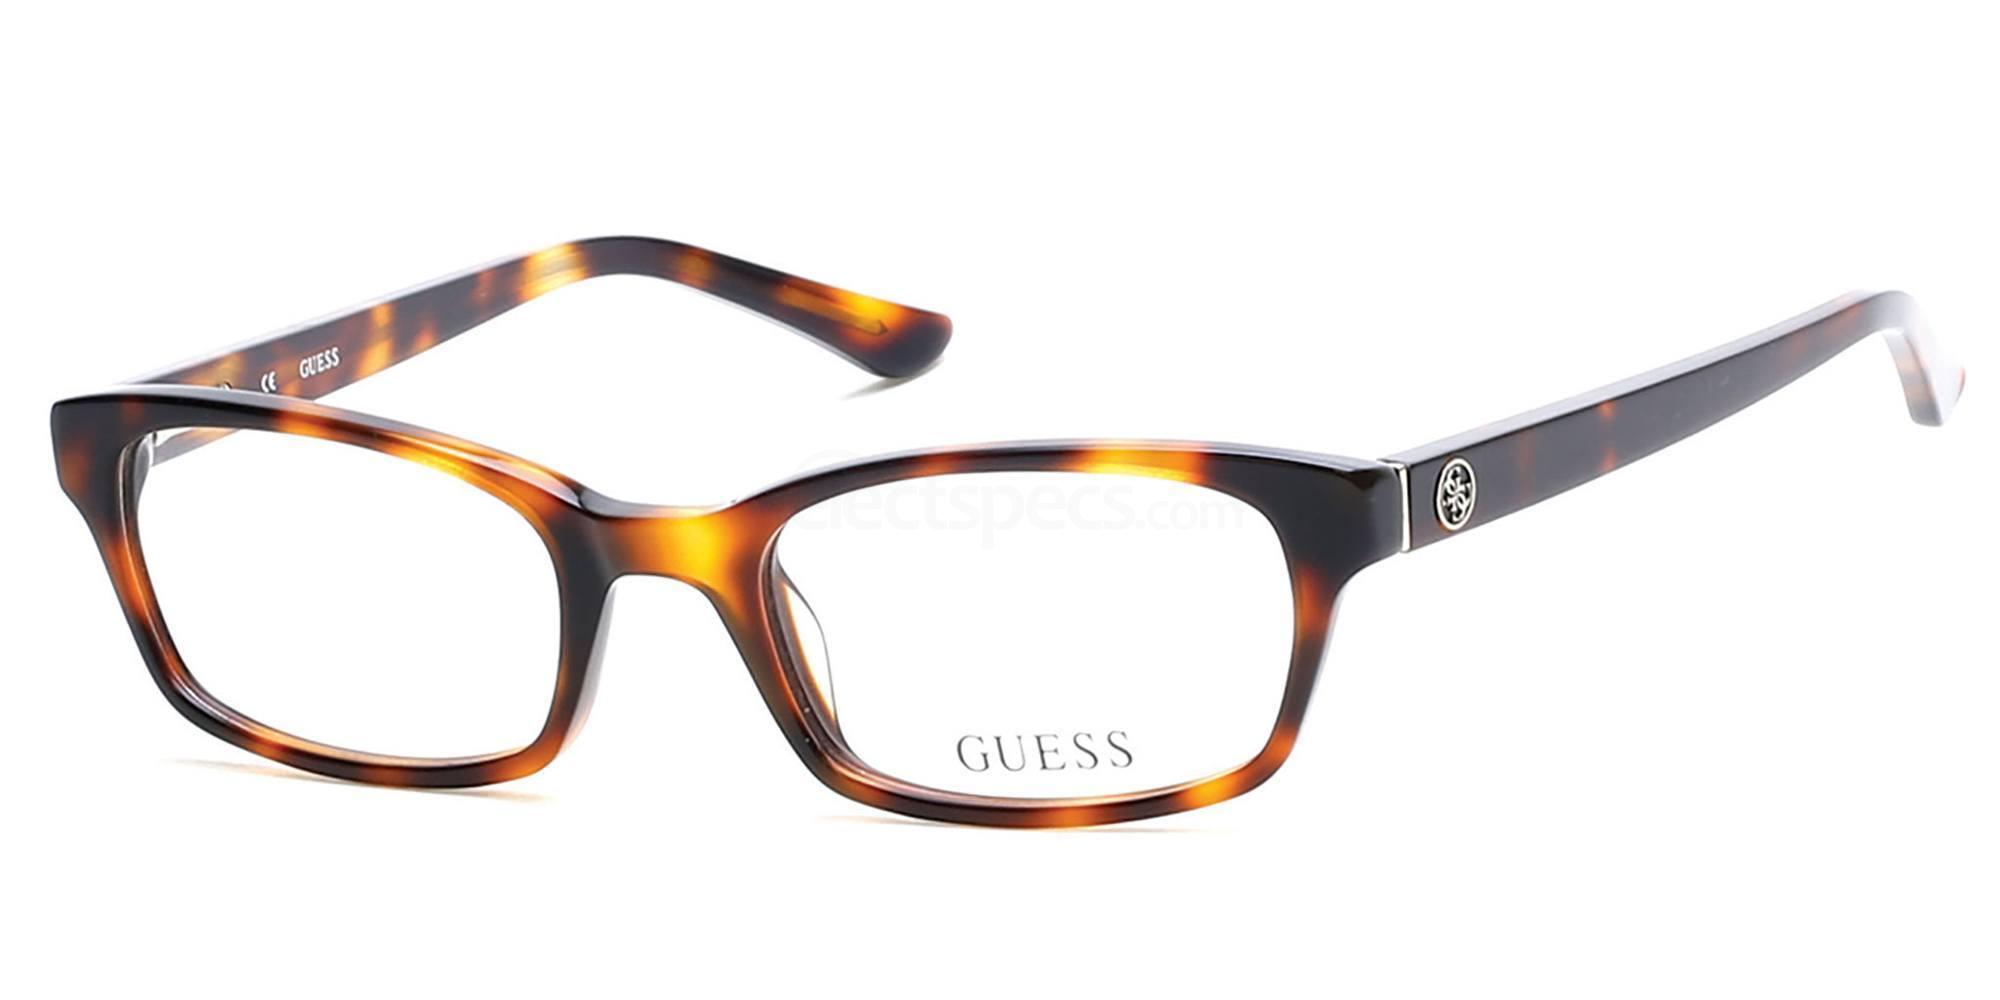 066 GU2535 Glasses, Guess